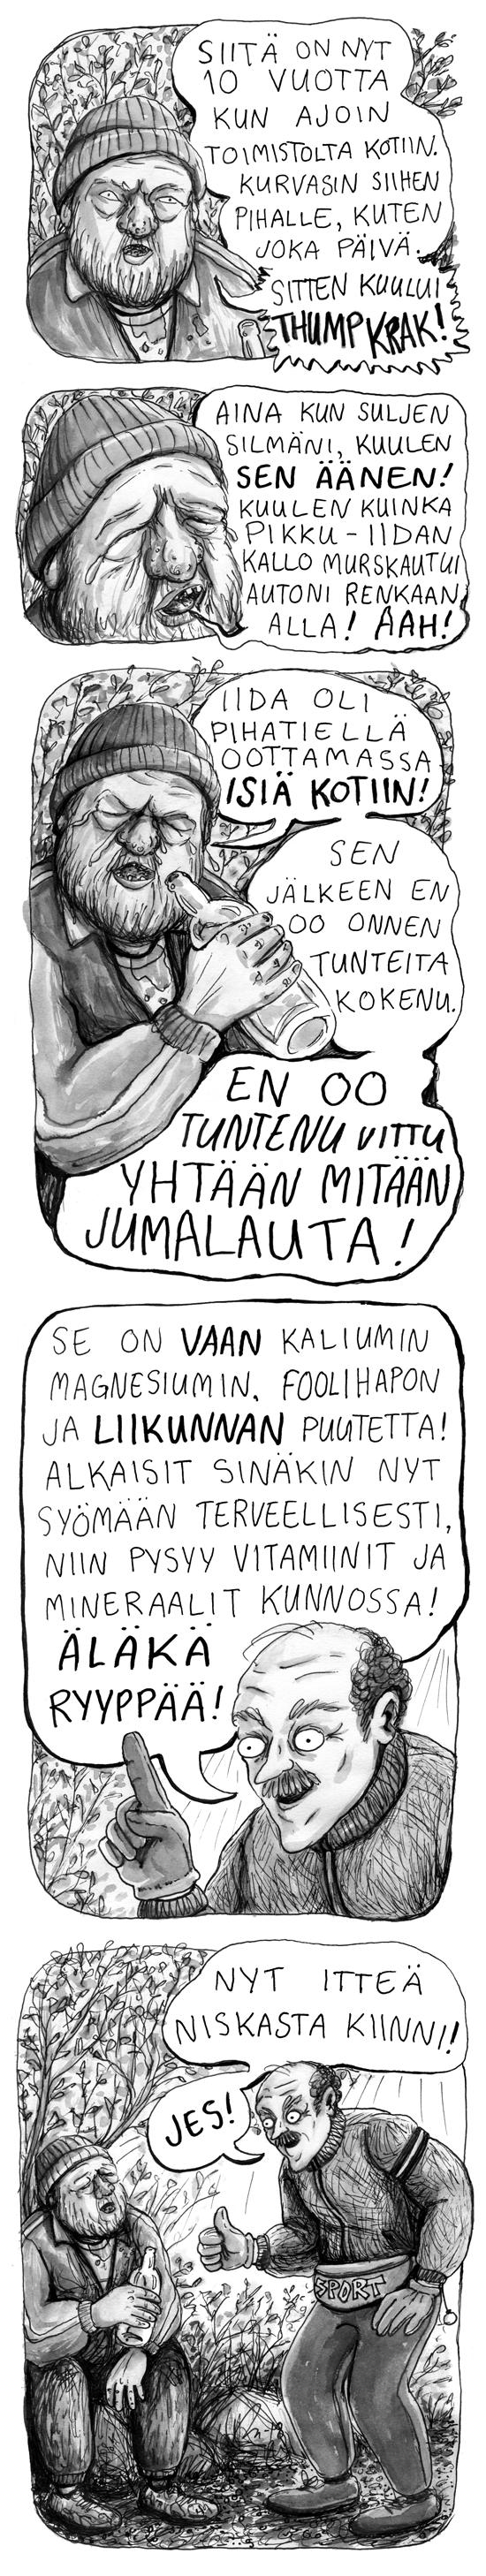 juppo_masistelee